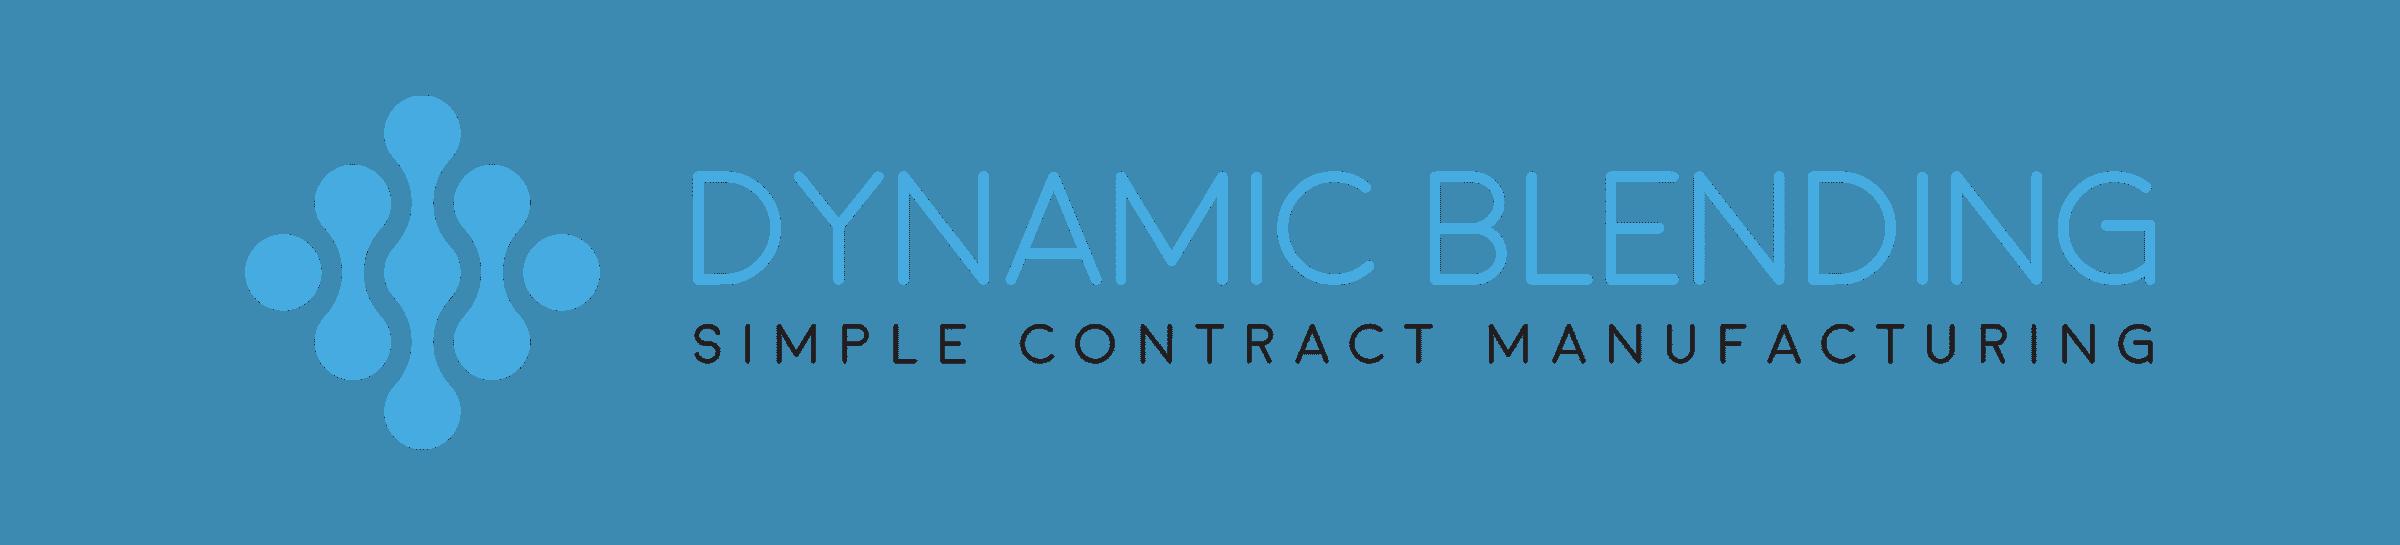 CBD Manufacturer - Dynamic Blending